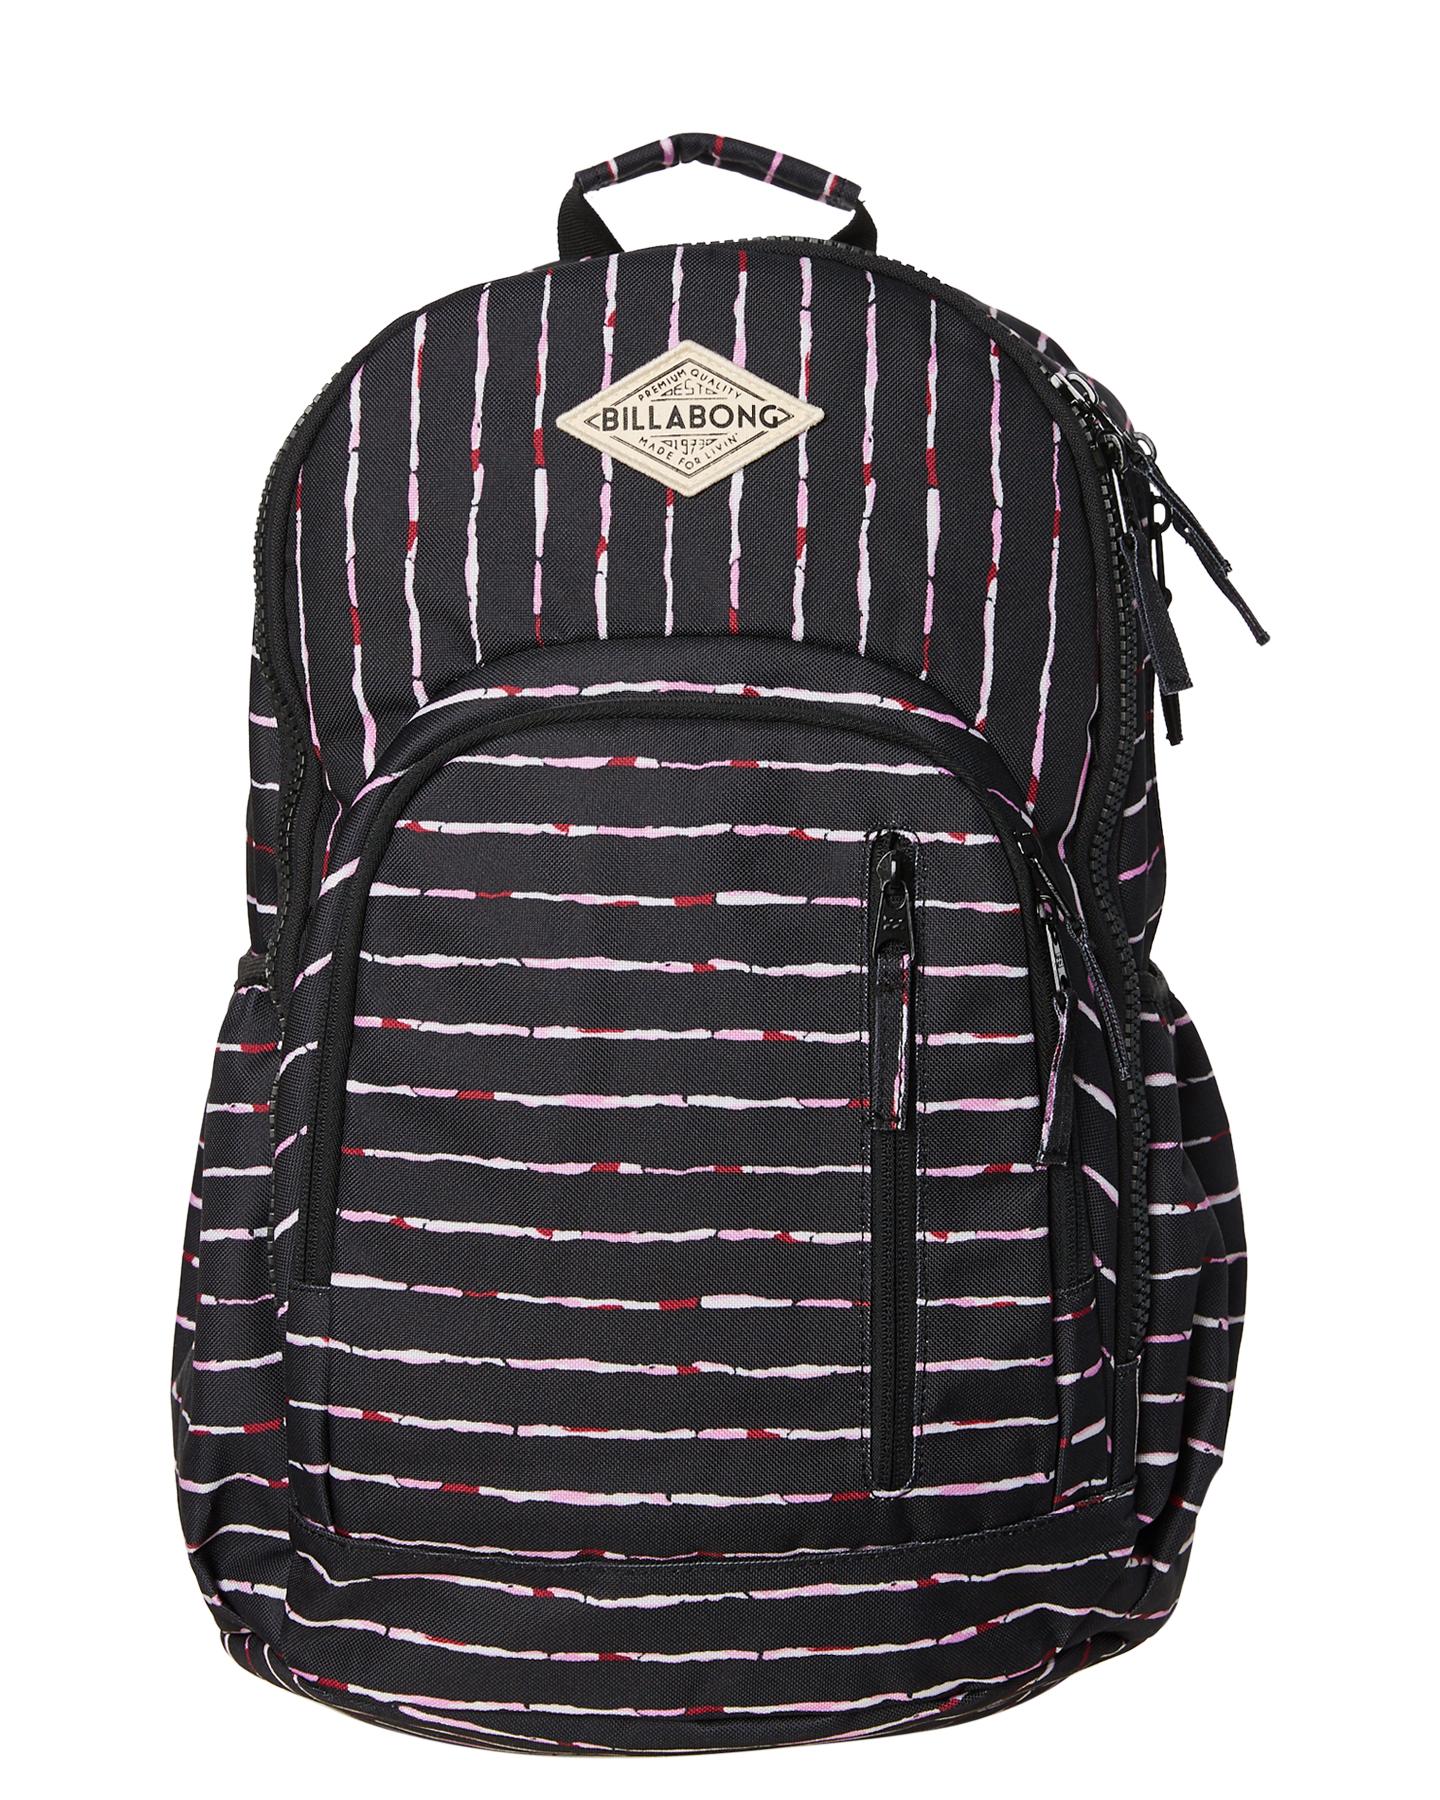 New billabong womens roadie backpack mesh black ebay JPG 1440x1800 Billabong  roadie backpack d2b515f6c4bf6